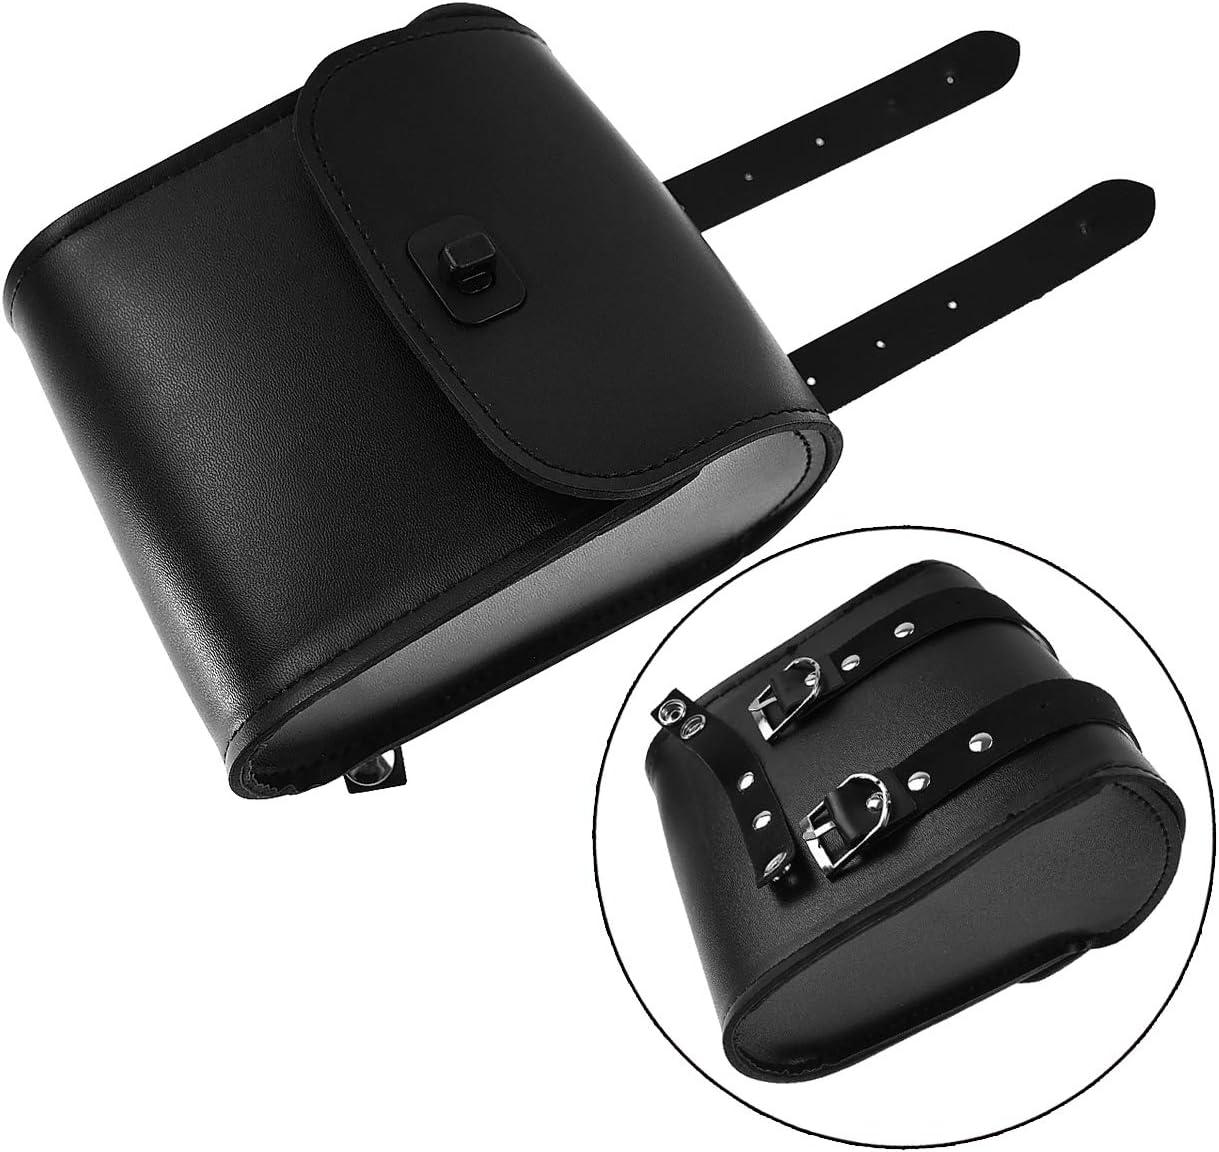 Rebacker Universal Motorcycle Handlebar Bag Tool Case Saddle Bag Belt Pouch Accessories,Brown